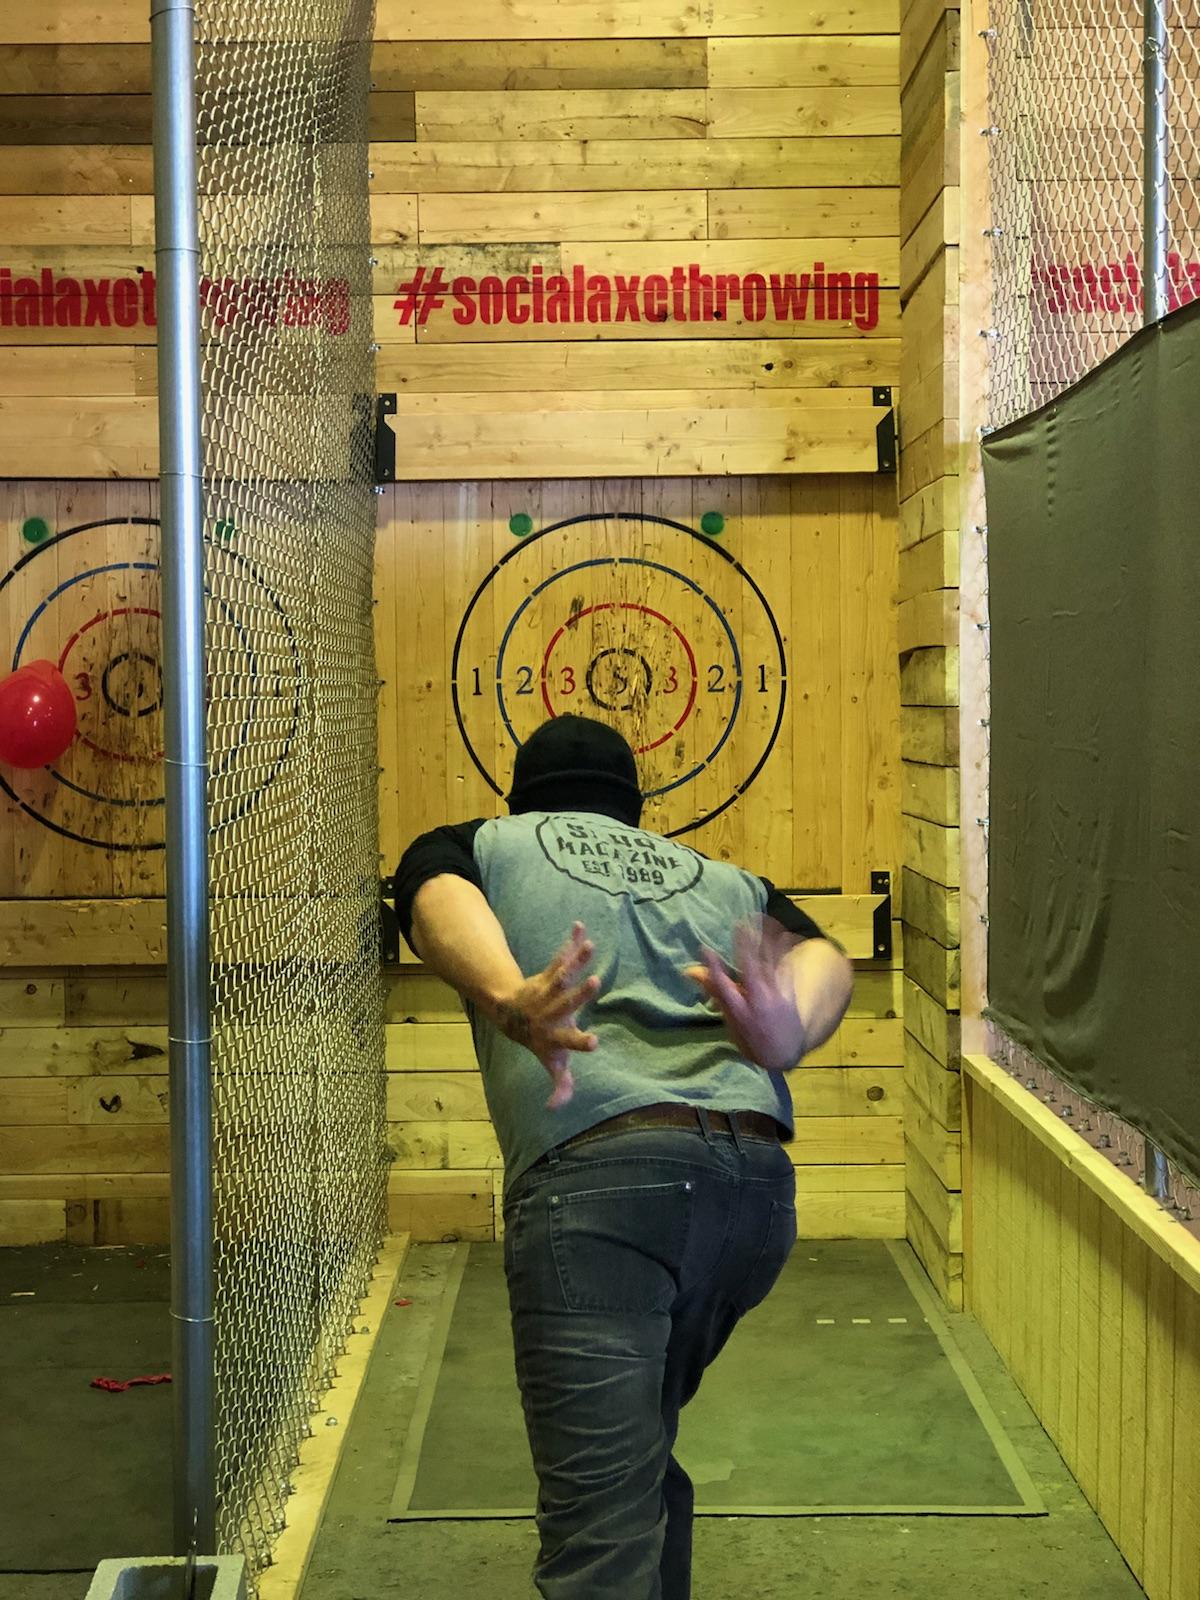 target club chair toddler adirondack this is primal: social axe throwing in slc – slug magazine